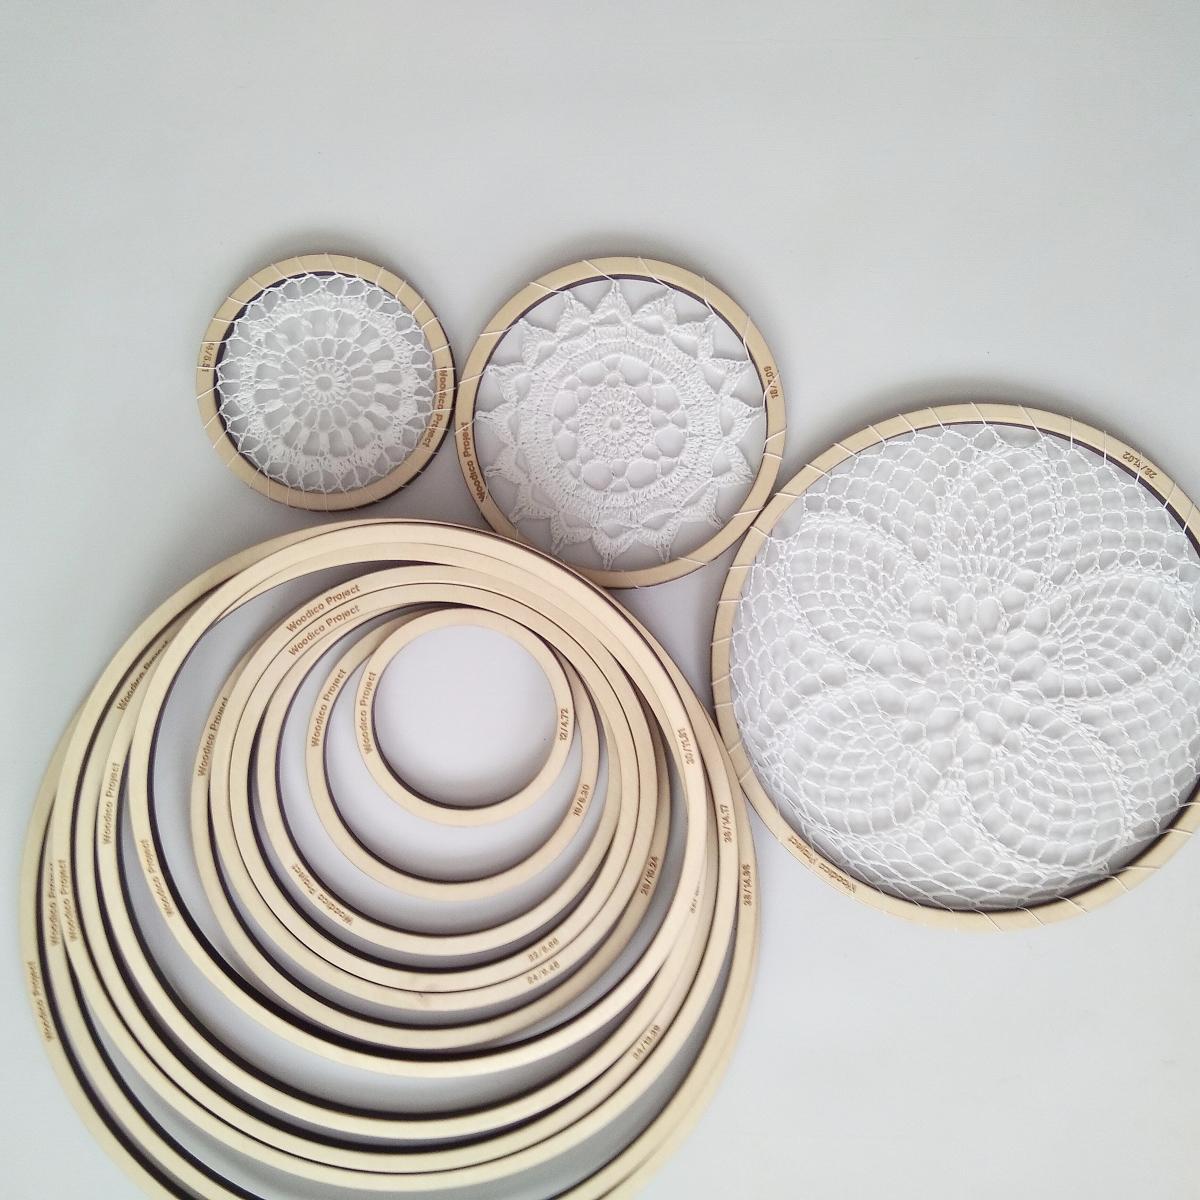 woodico.pro dream catcher base set of 15 rings 12 40 cm 5 1200x1200 - Dream catcher base / Set of 15 rings 12-40 cm